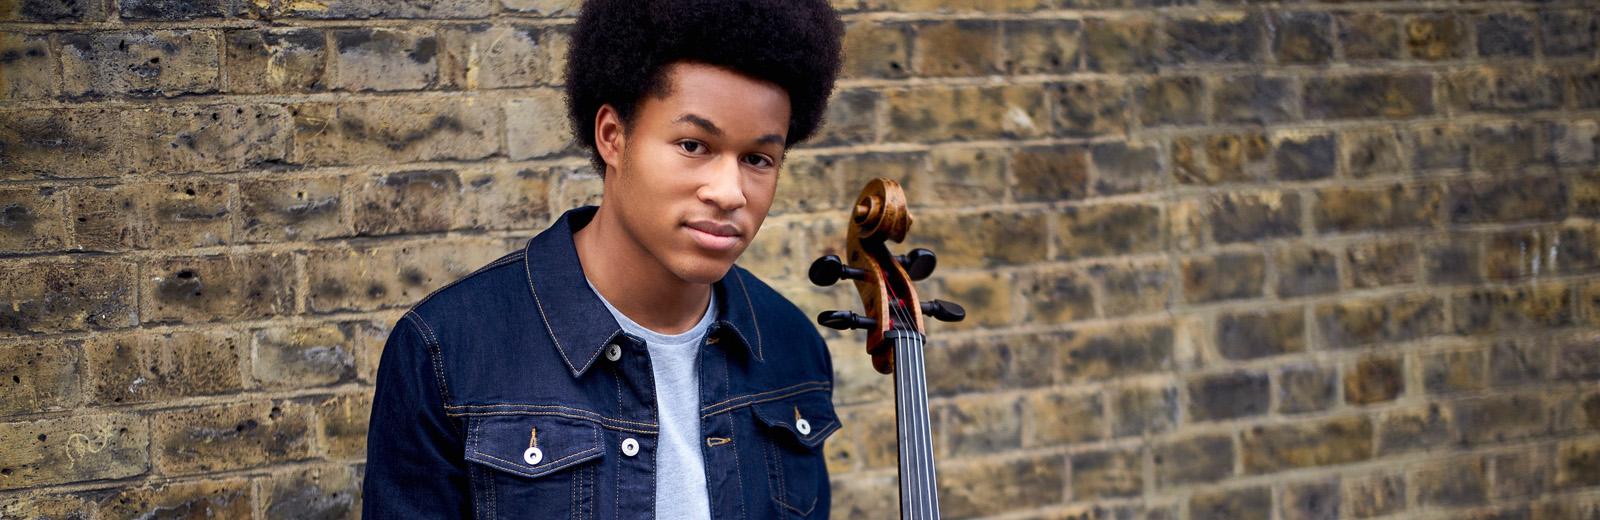 Royal Conservatoire of Scotland announces new season of captivating performance Image